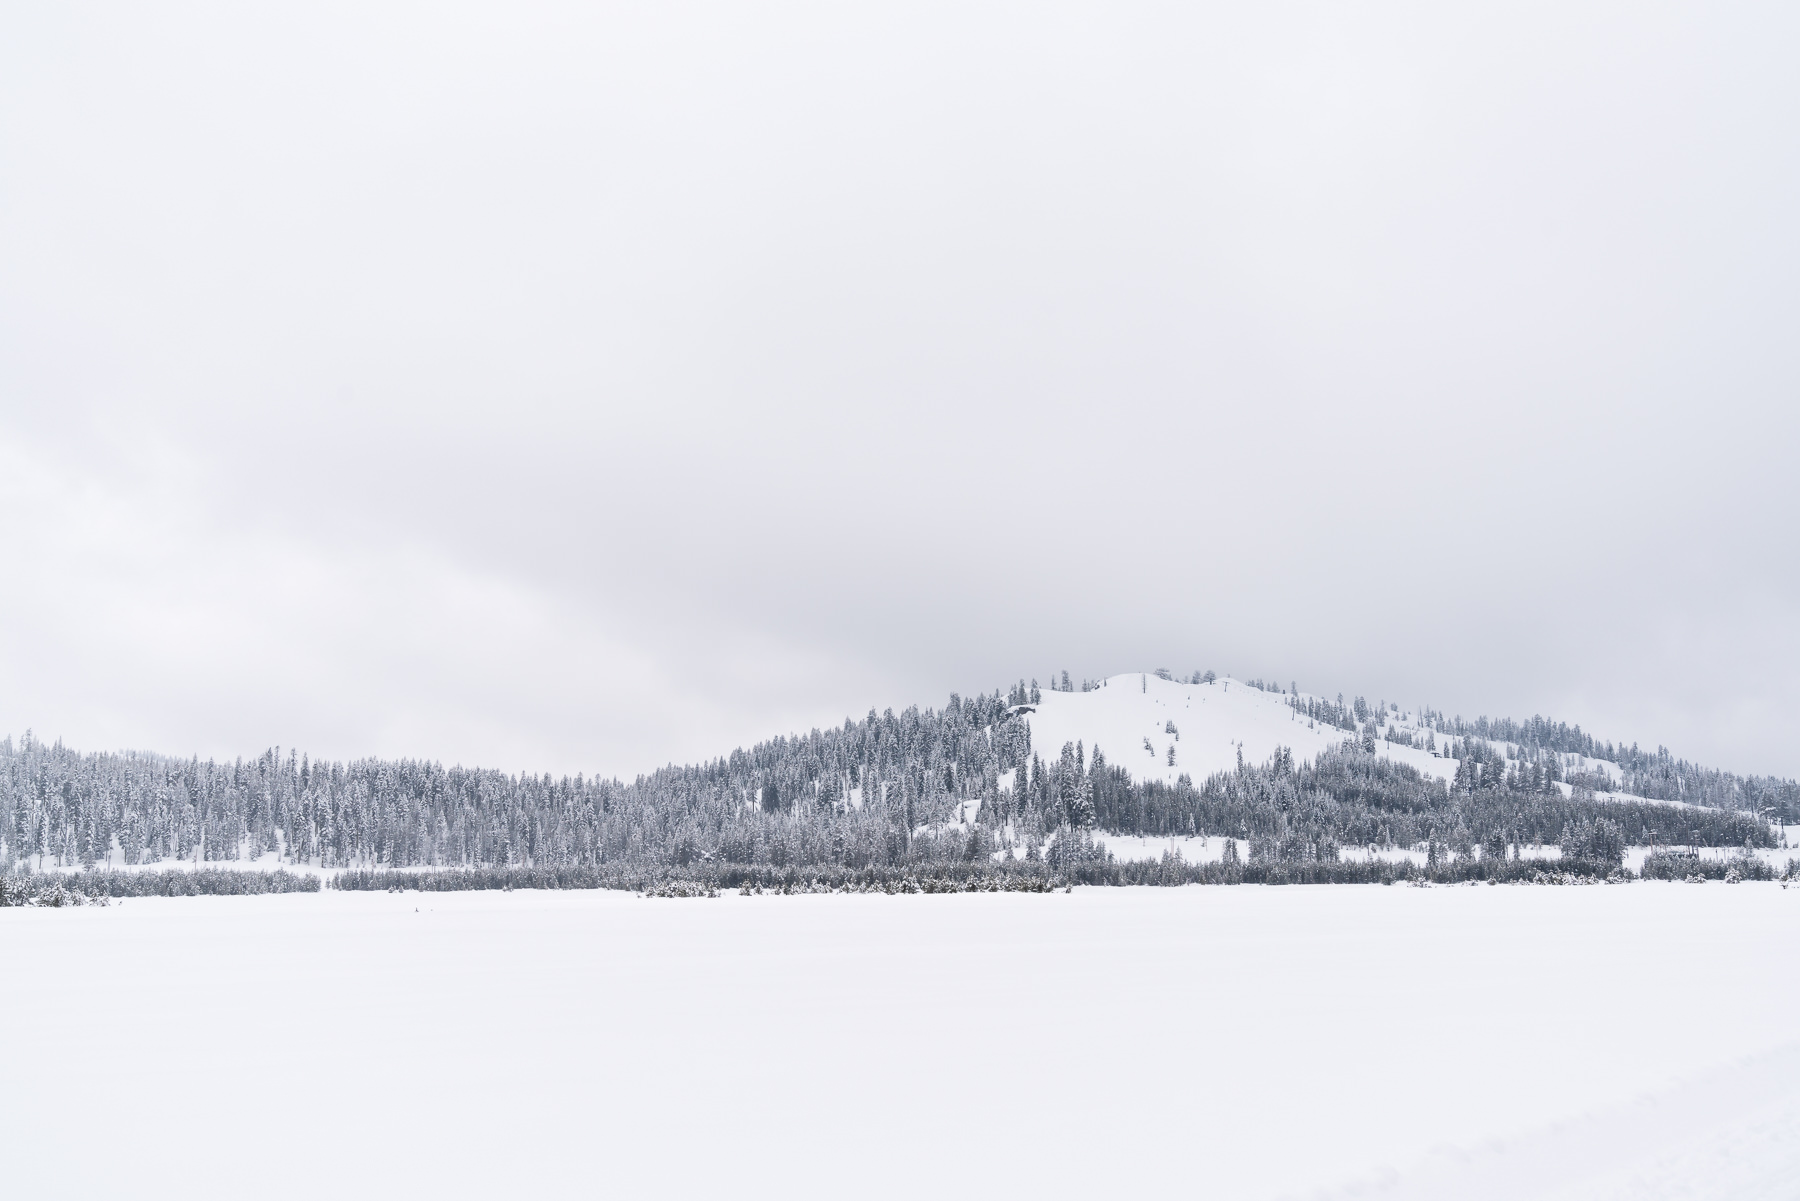 2019.03.23 Snowy Tahoe © Jennifer Carr Photography-21.jpg